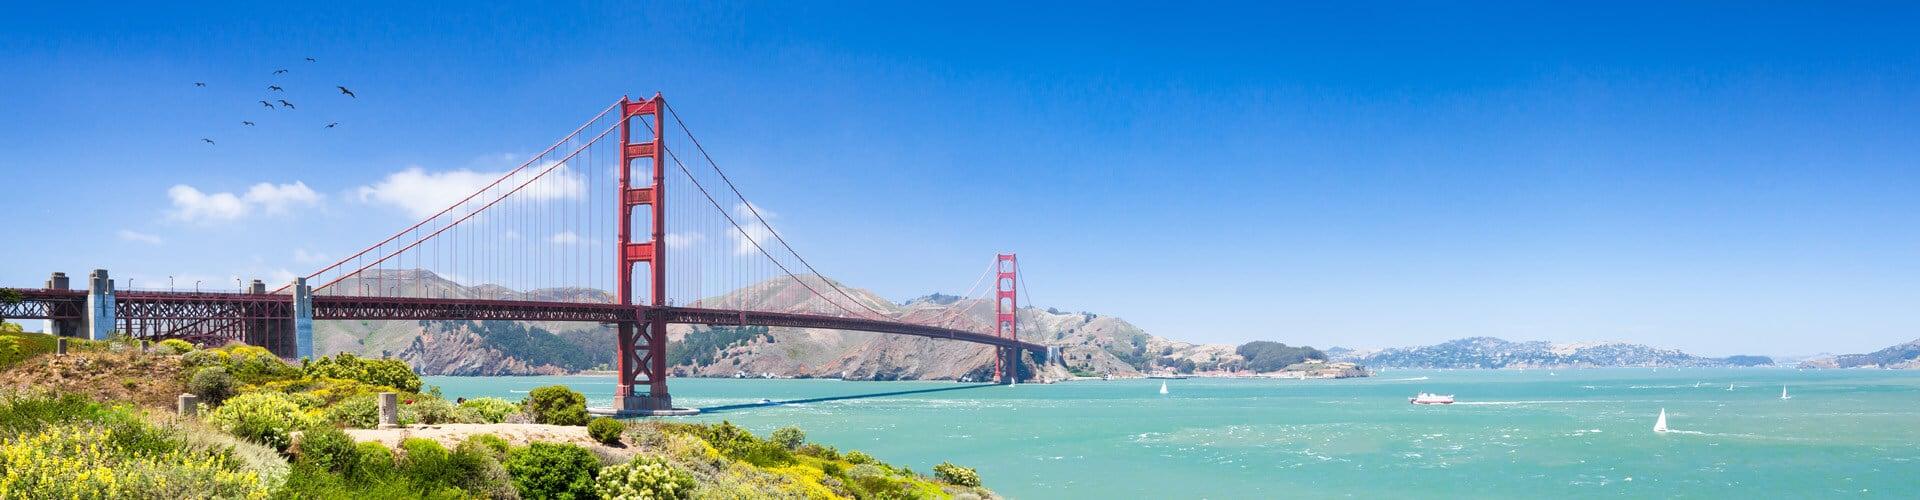 San Francisco, America: The City Free of Plastic Bottles